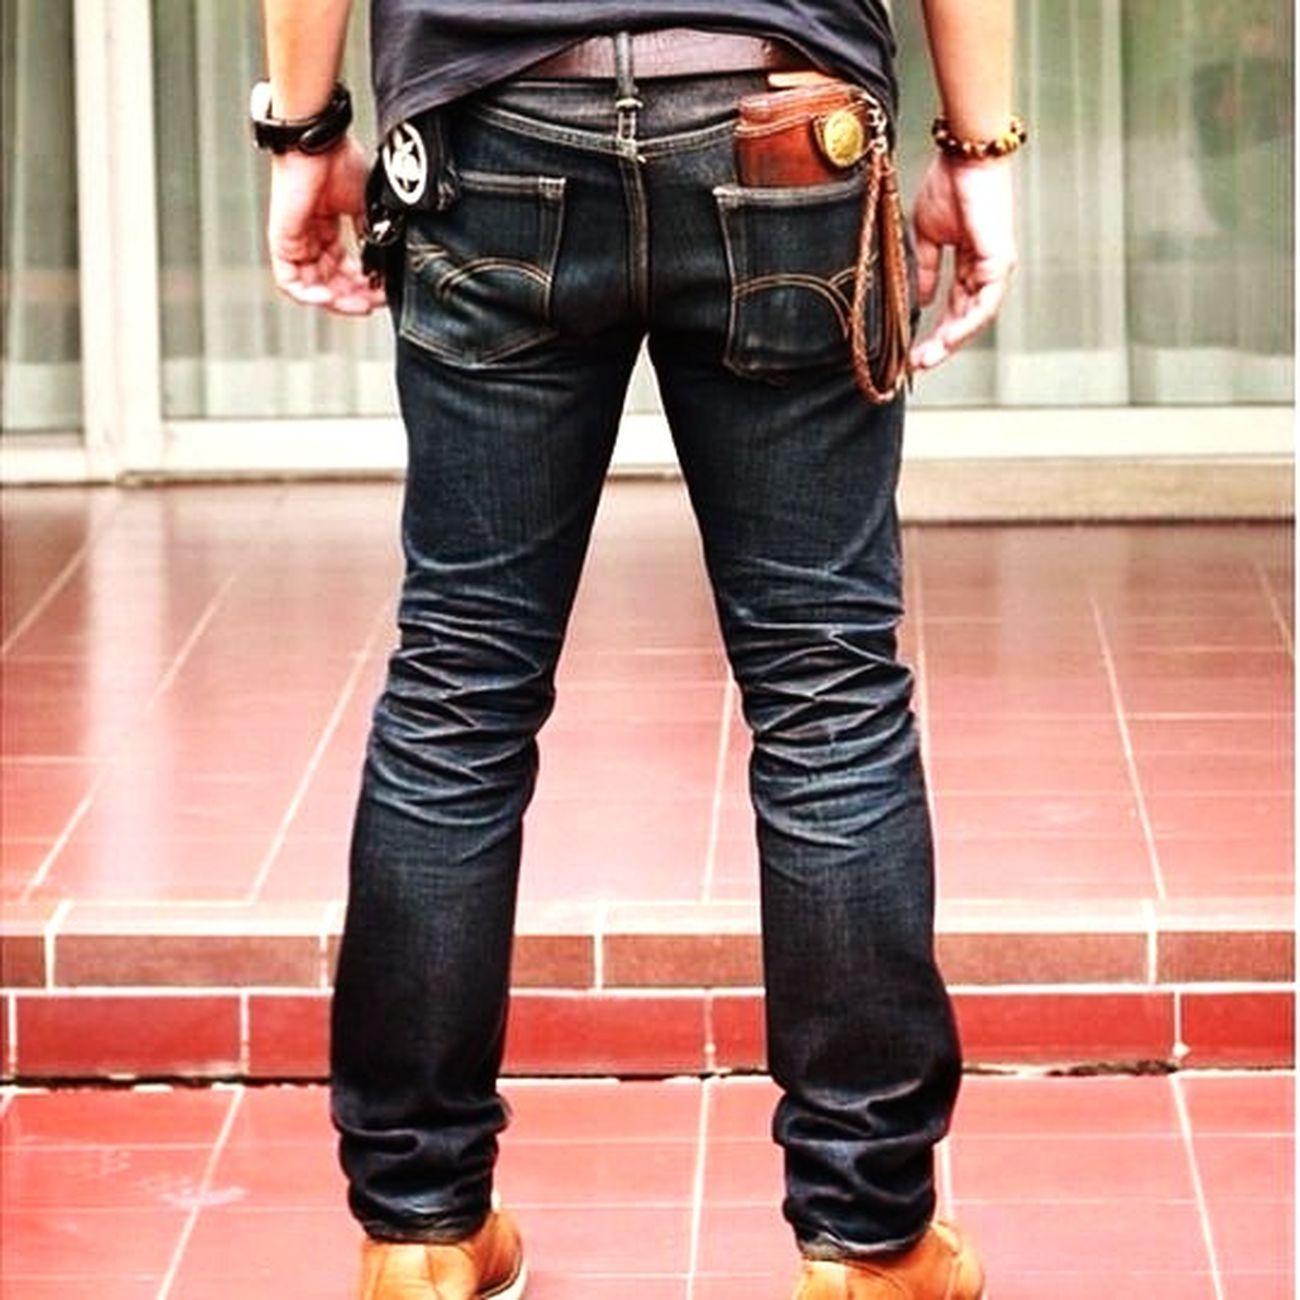 Theflathead WorkWear Vintage Jeans Manstyle Japandenim Samuraisiamshop Momotarocustompocket Bangkok Thailand. WalletLeather